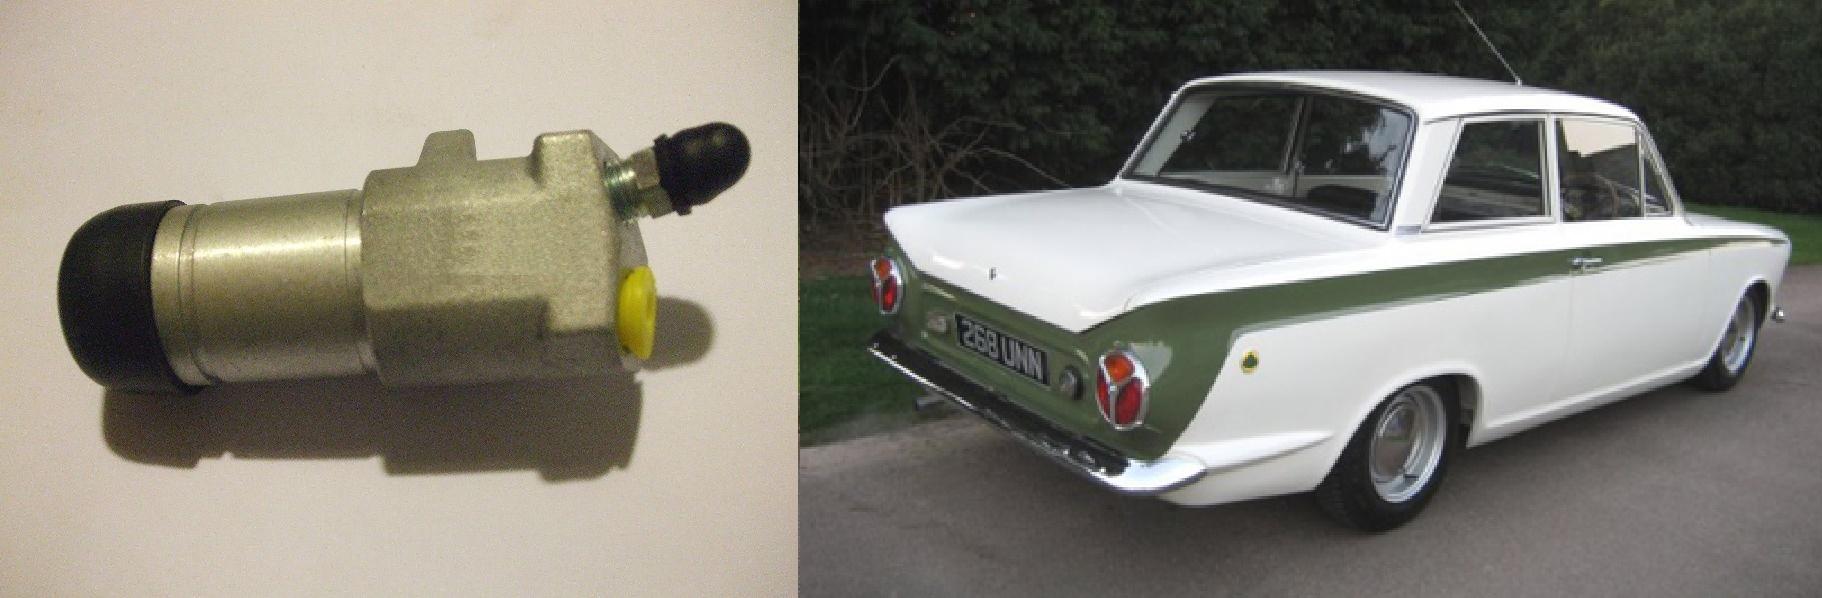 1962-74 TRIUMPH GT6 Vitesse Kit Car     CLUTCH MASTER CYLINDER